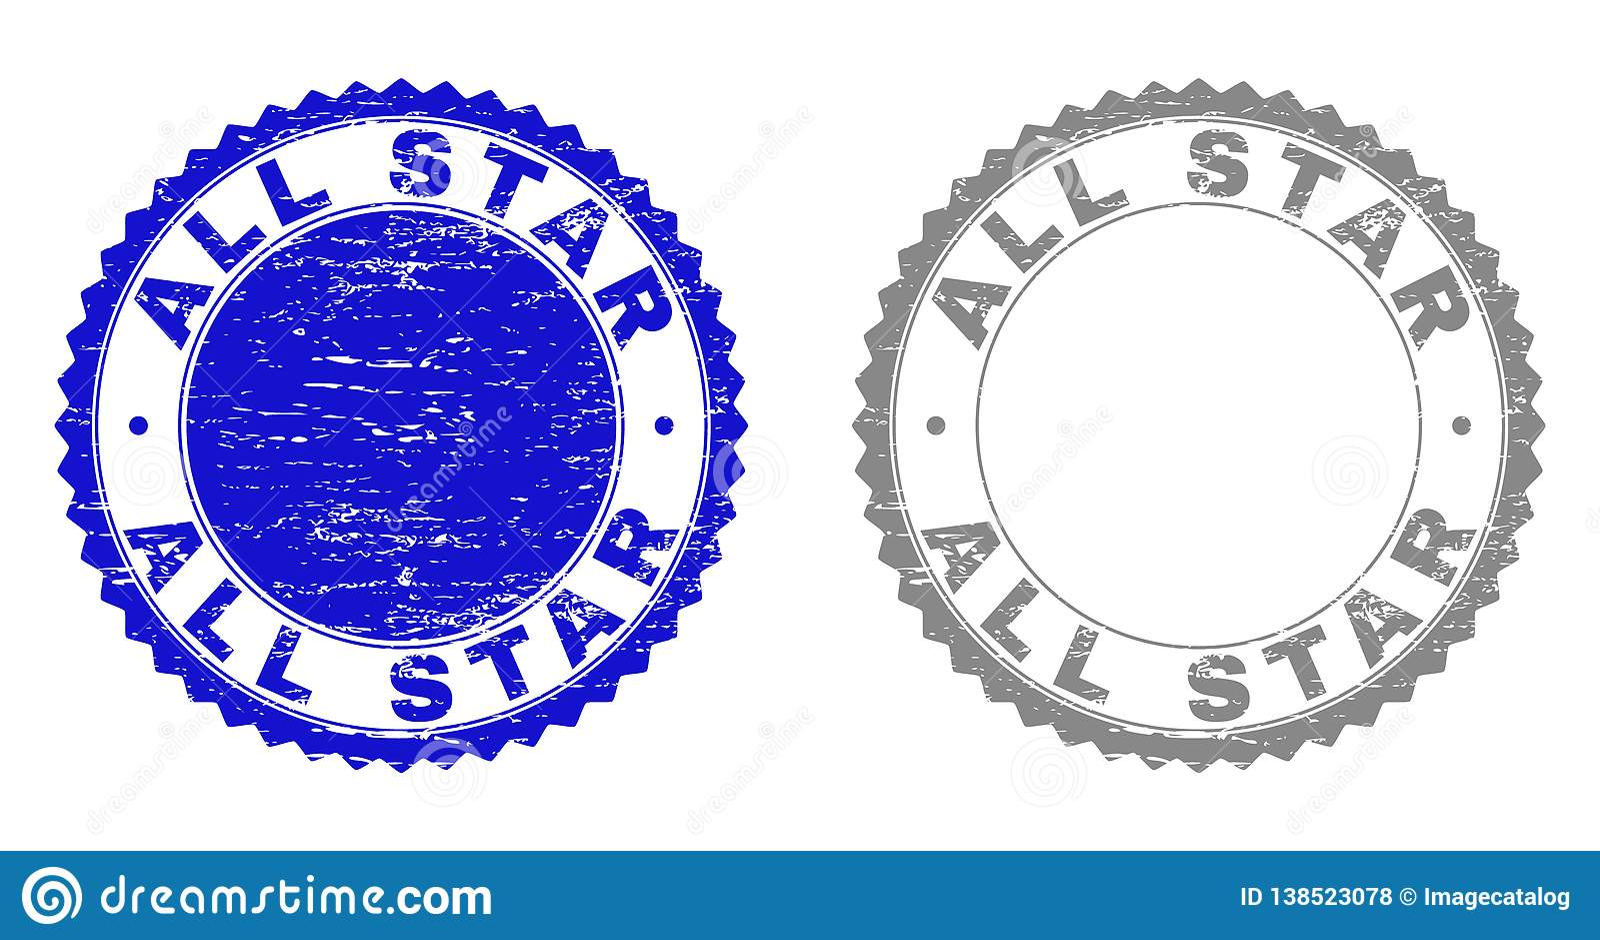 ALL STAR texturisé a rayé des timbres avec le ruban